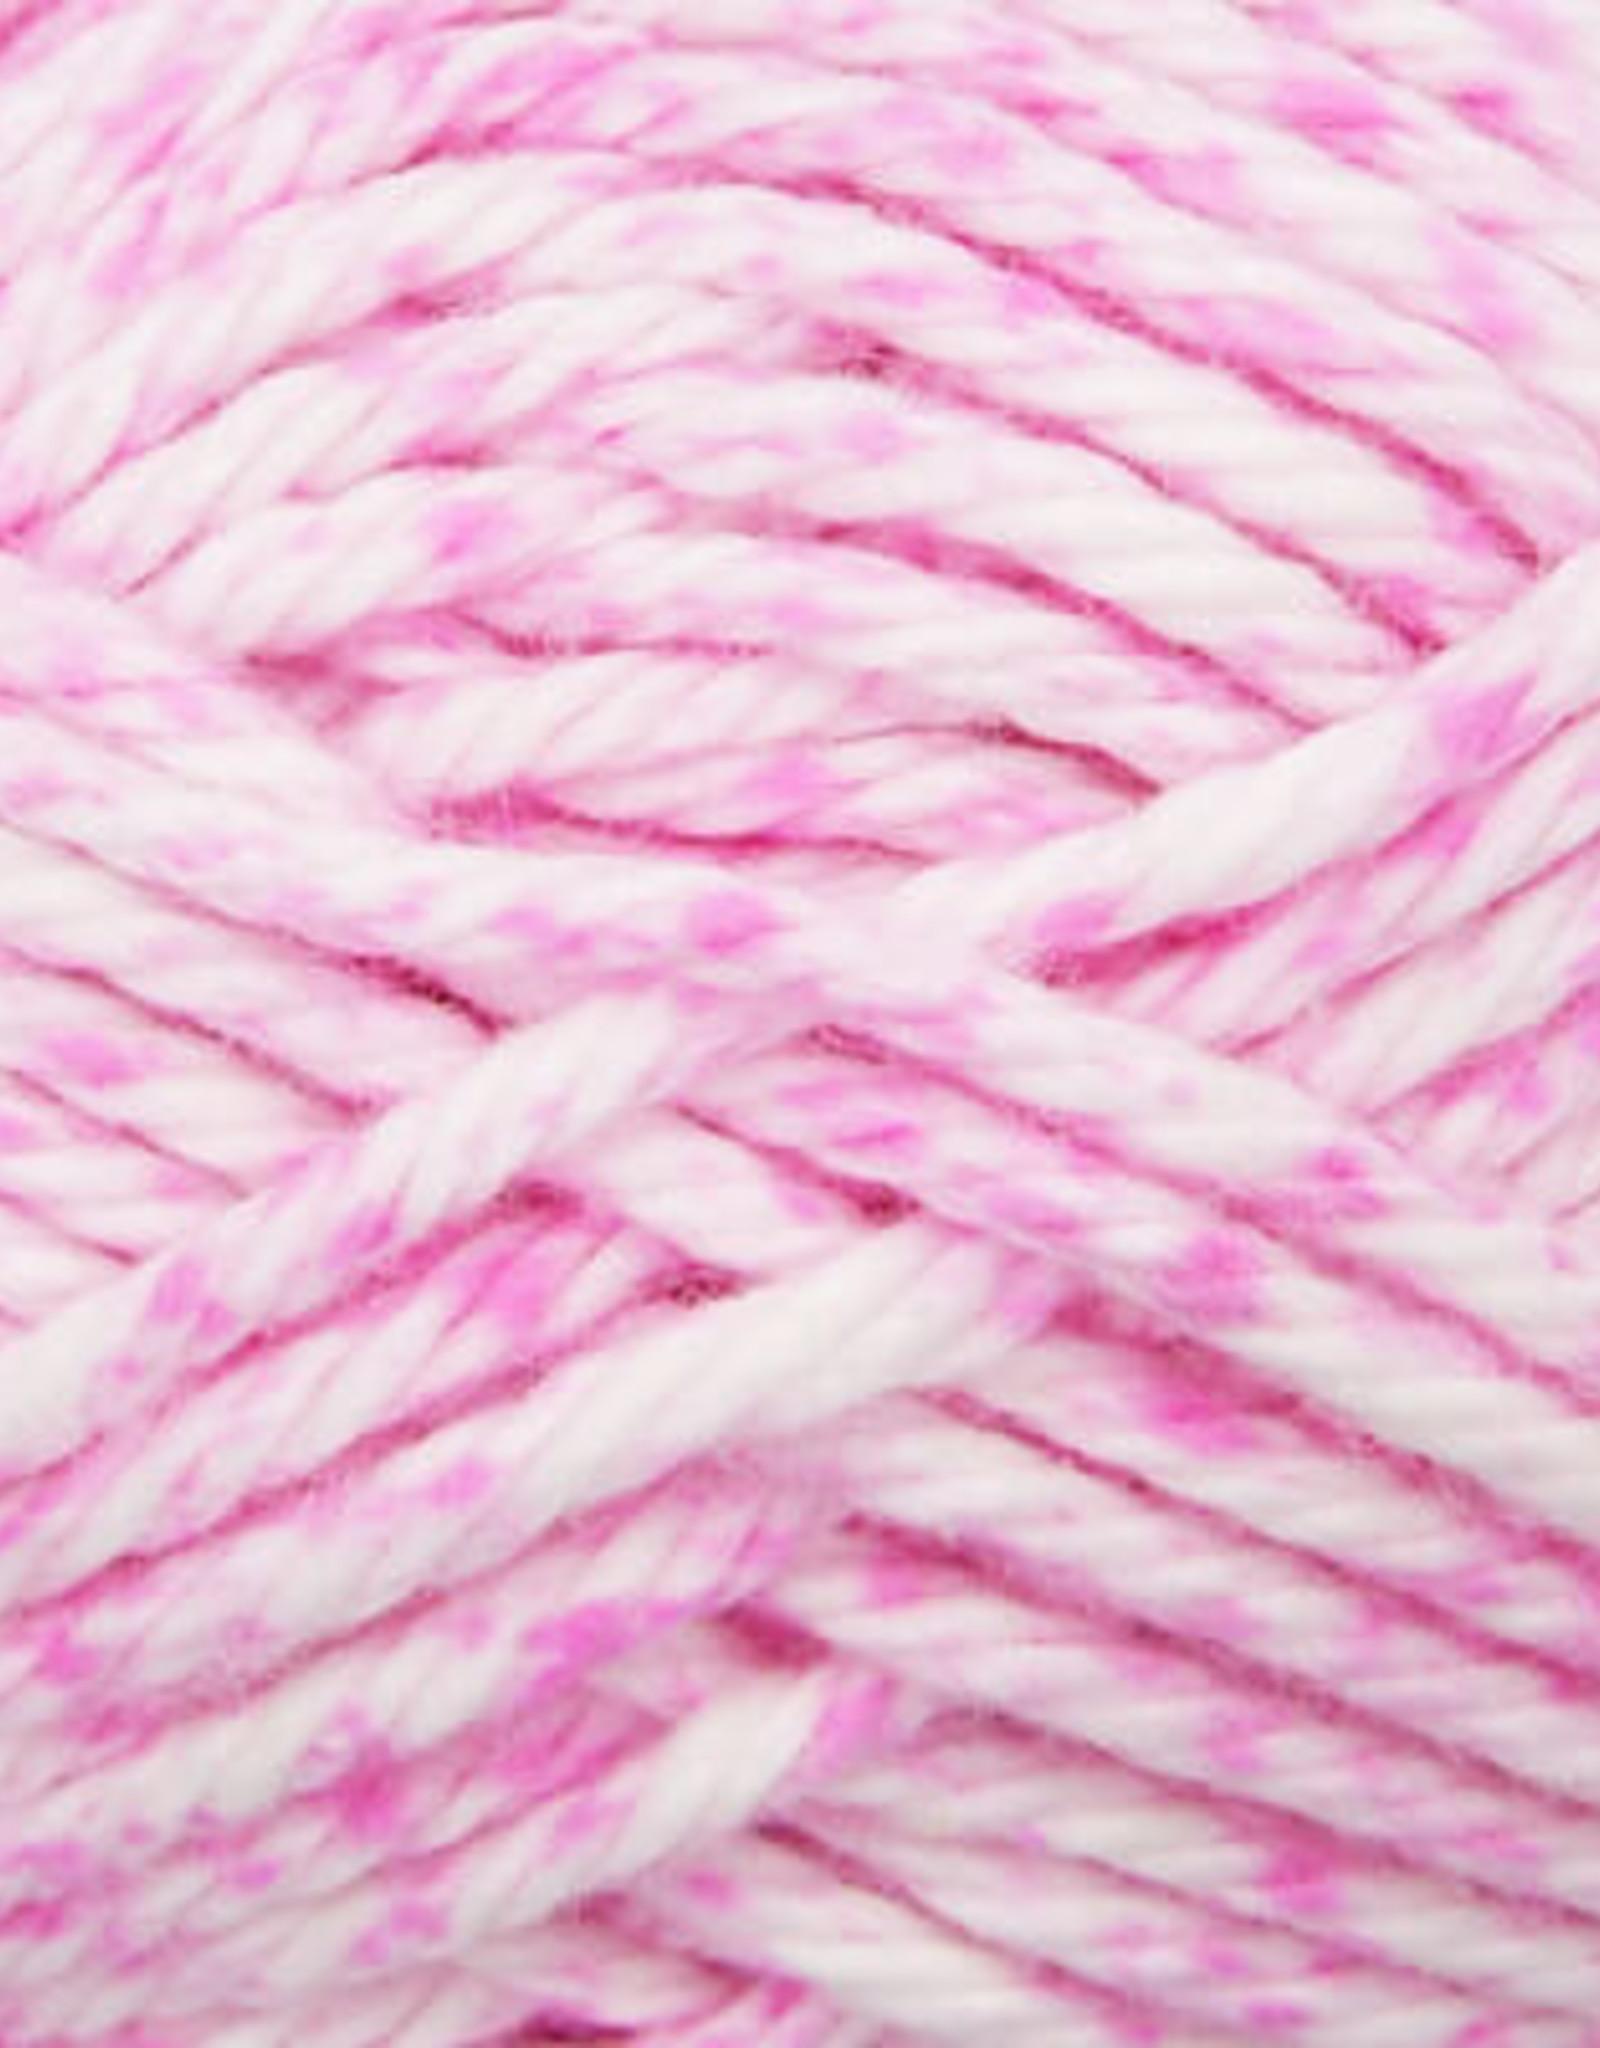 Sudz Sudz Cotton Spray - Estelle Yarns